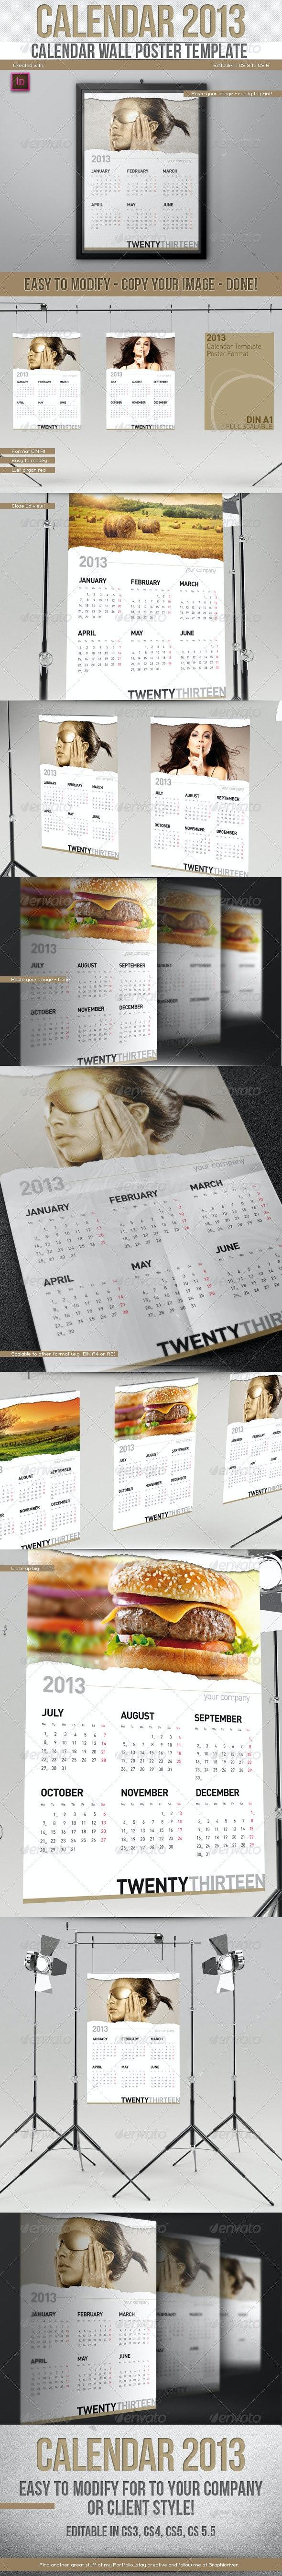 2013 Calendar // Wall Poster Template // Paper Rip - Calendars Stationery